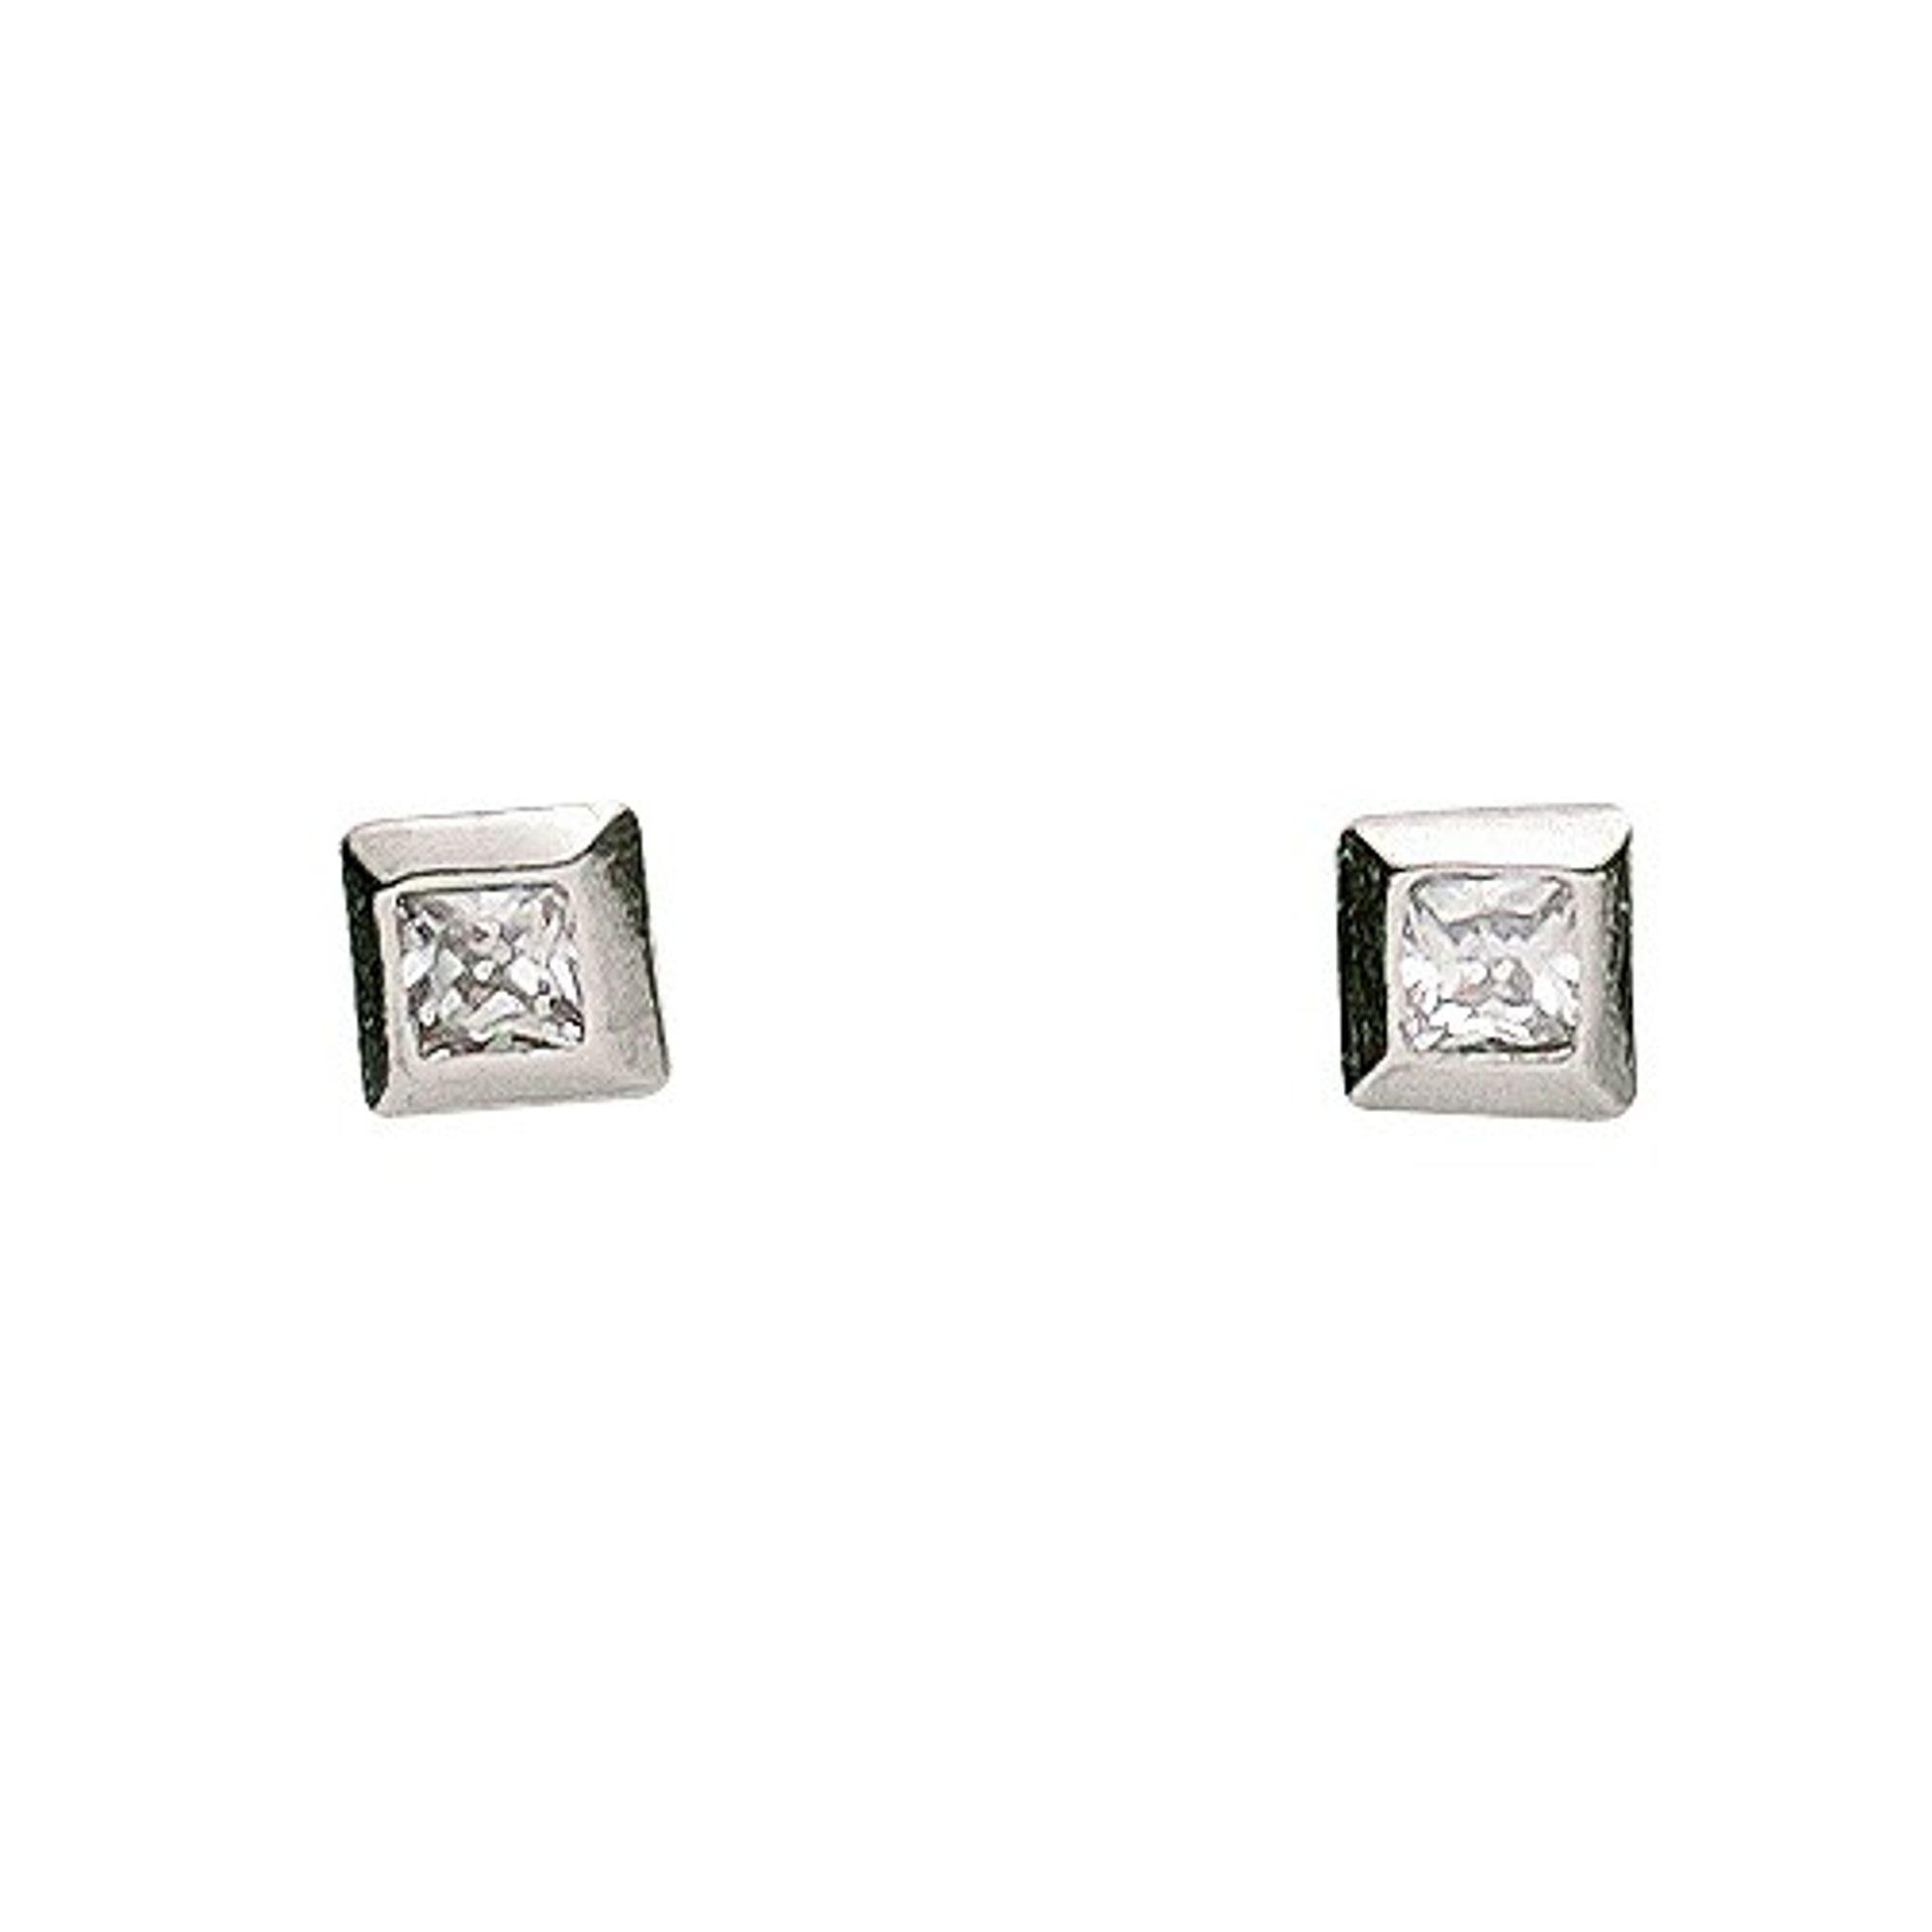 Basic Silber 01.1099W Damen Ohrstecker Silber Zirkonia weiß